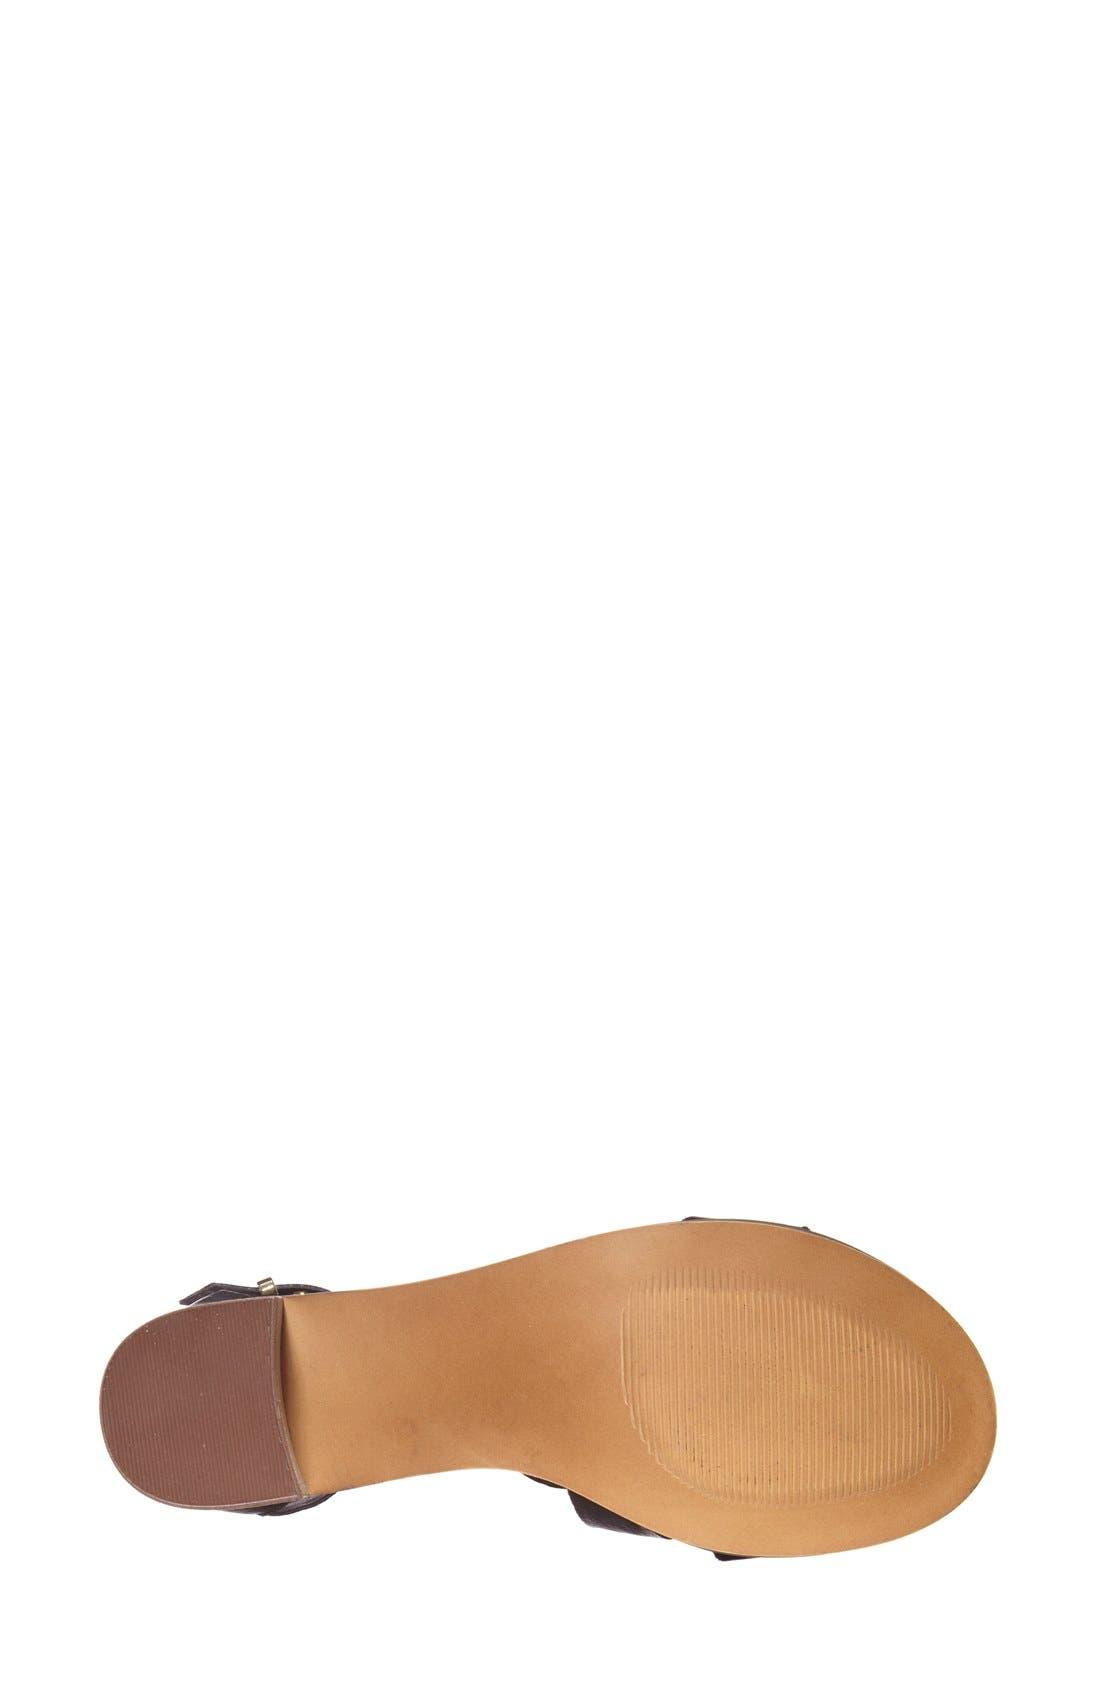 'Rosana' Double Ankle Strap Leather Sandal,                             Alternate thumbnail 2, color,                             001